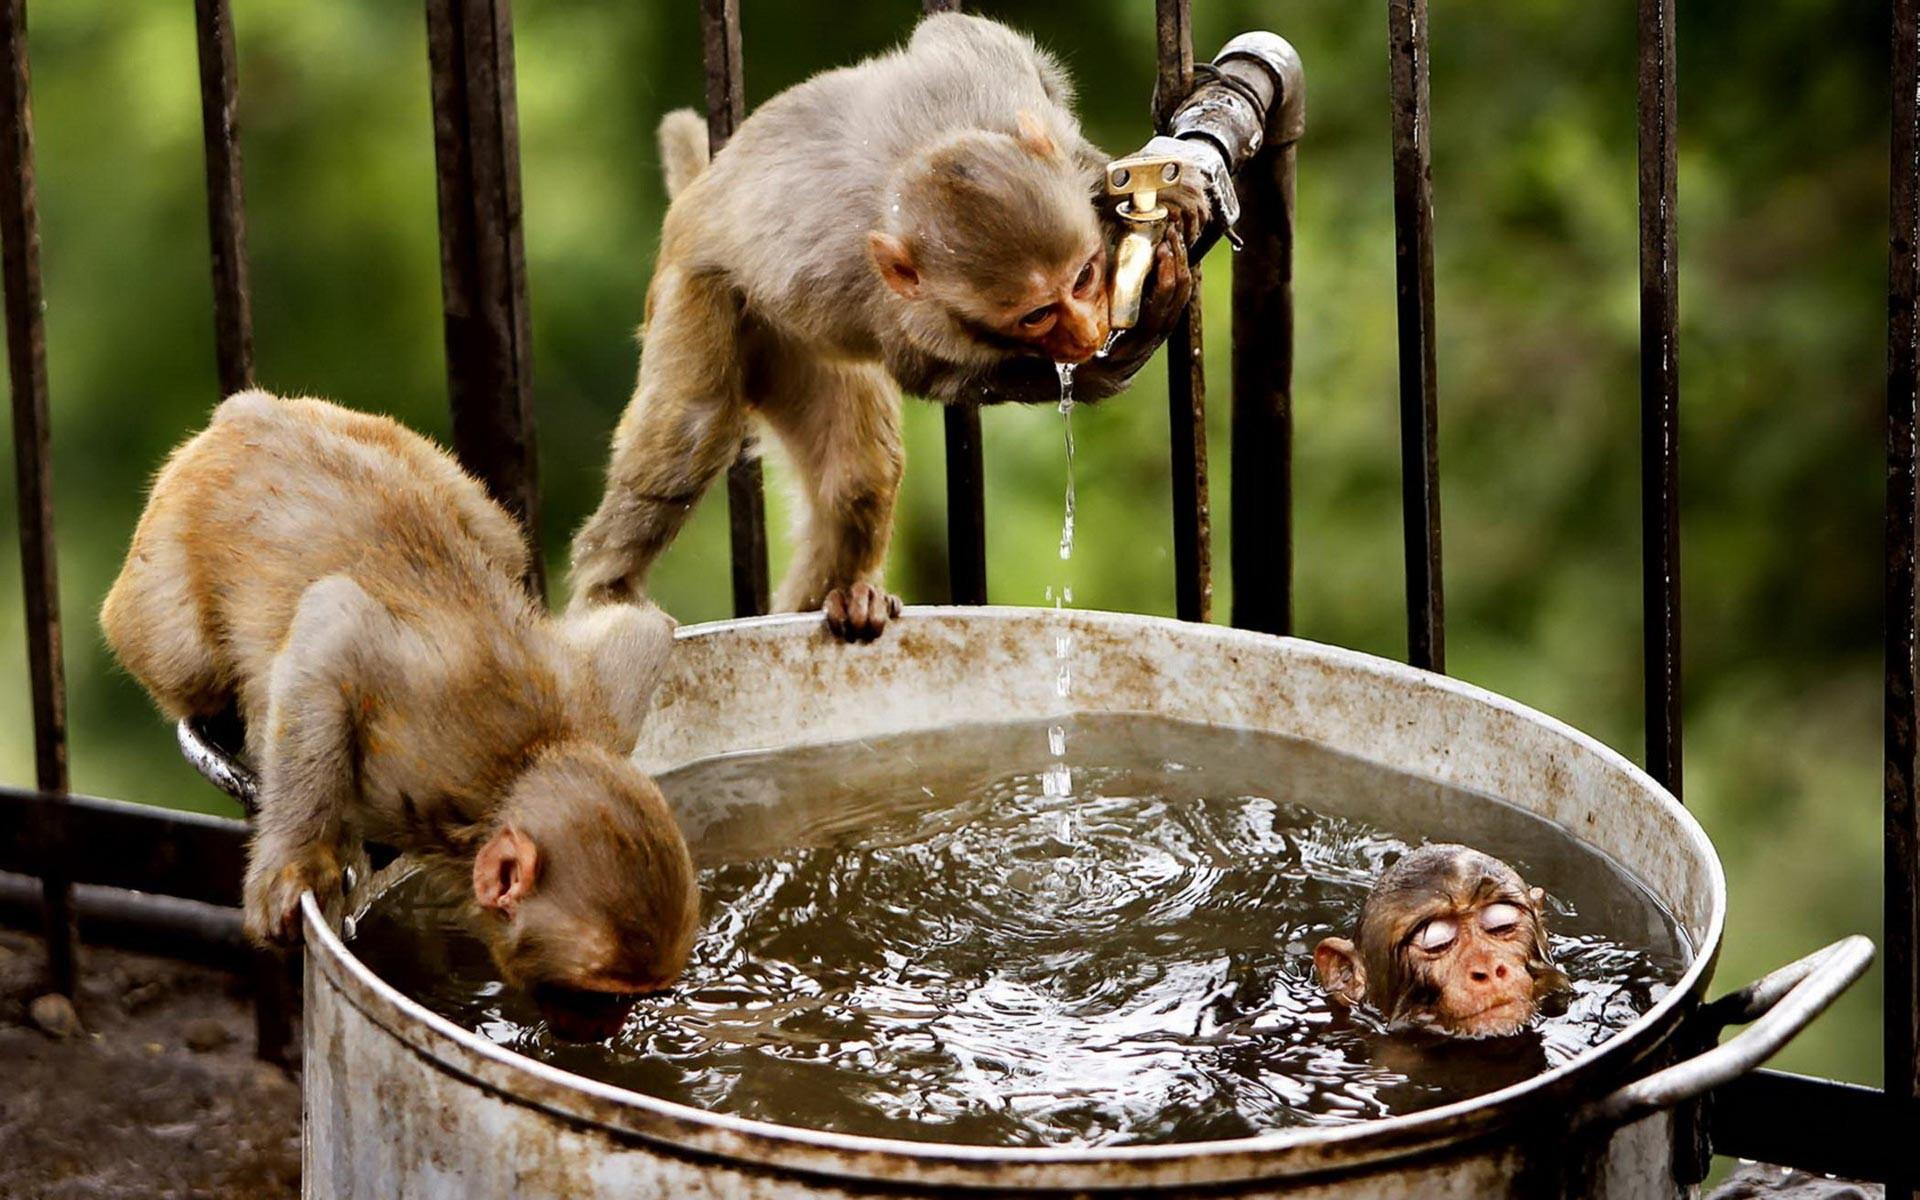 capuchin and dog Animals bed LYING monkey Pet HD Wallpaper | Naczelne |  Pinterest | Monkey, Dog and Animal